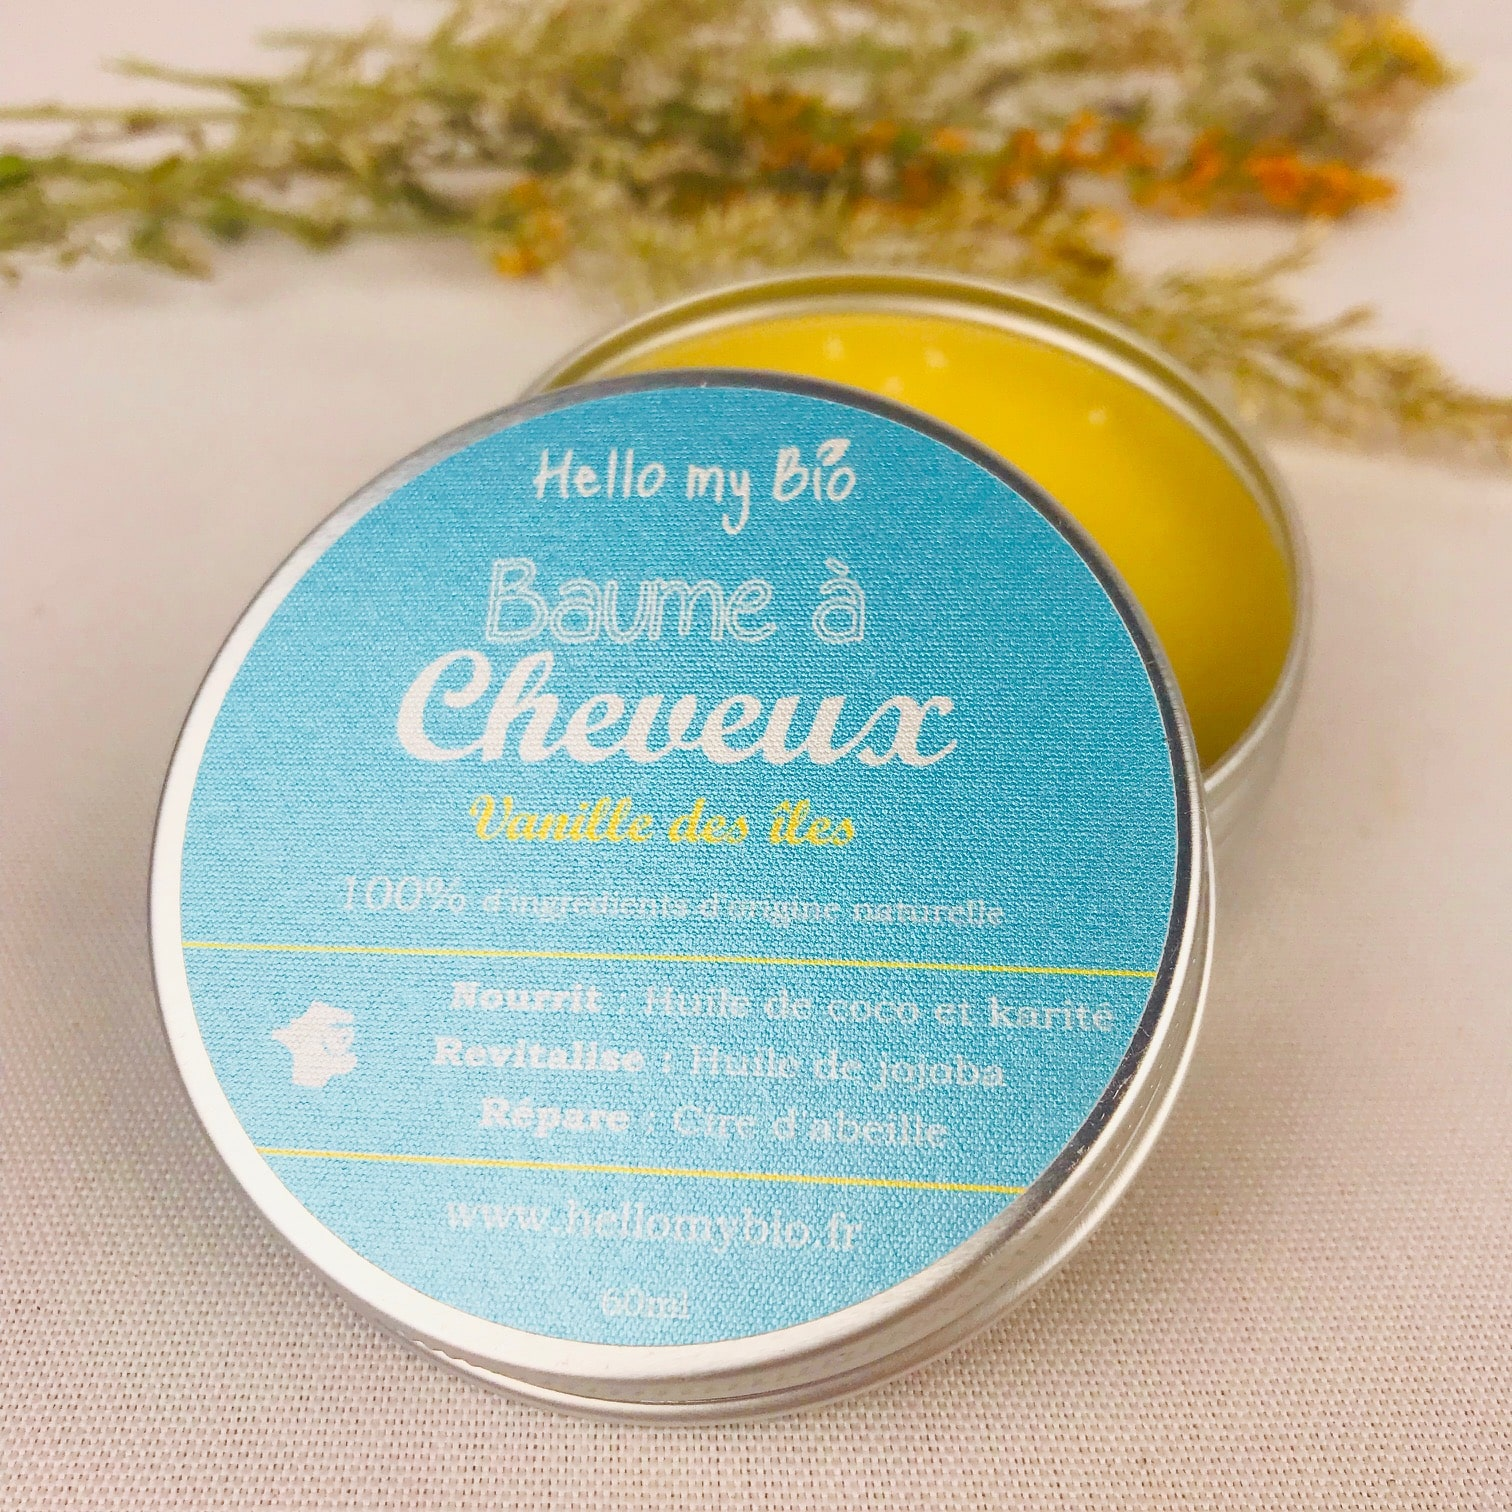 "<img src=""baume-a-cheveux.jpg"" alt=""baume à cheveux""/>"